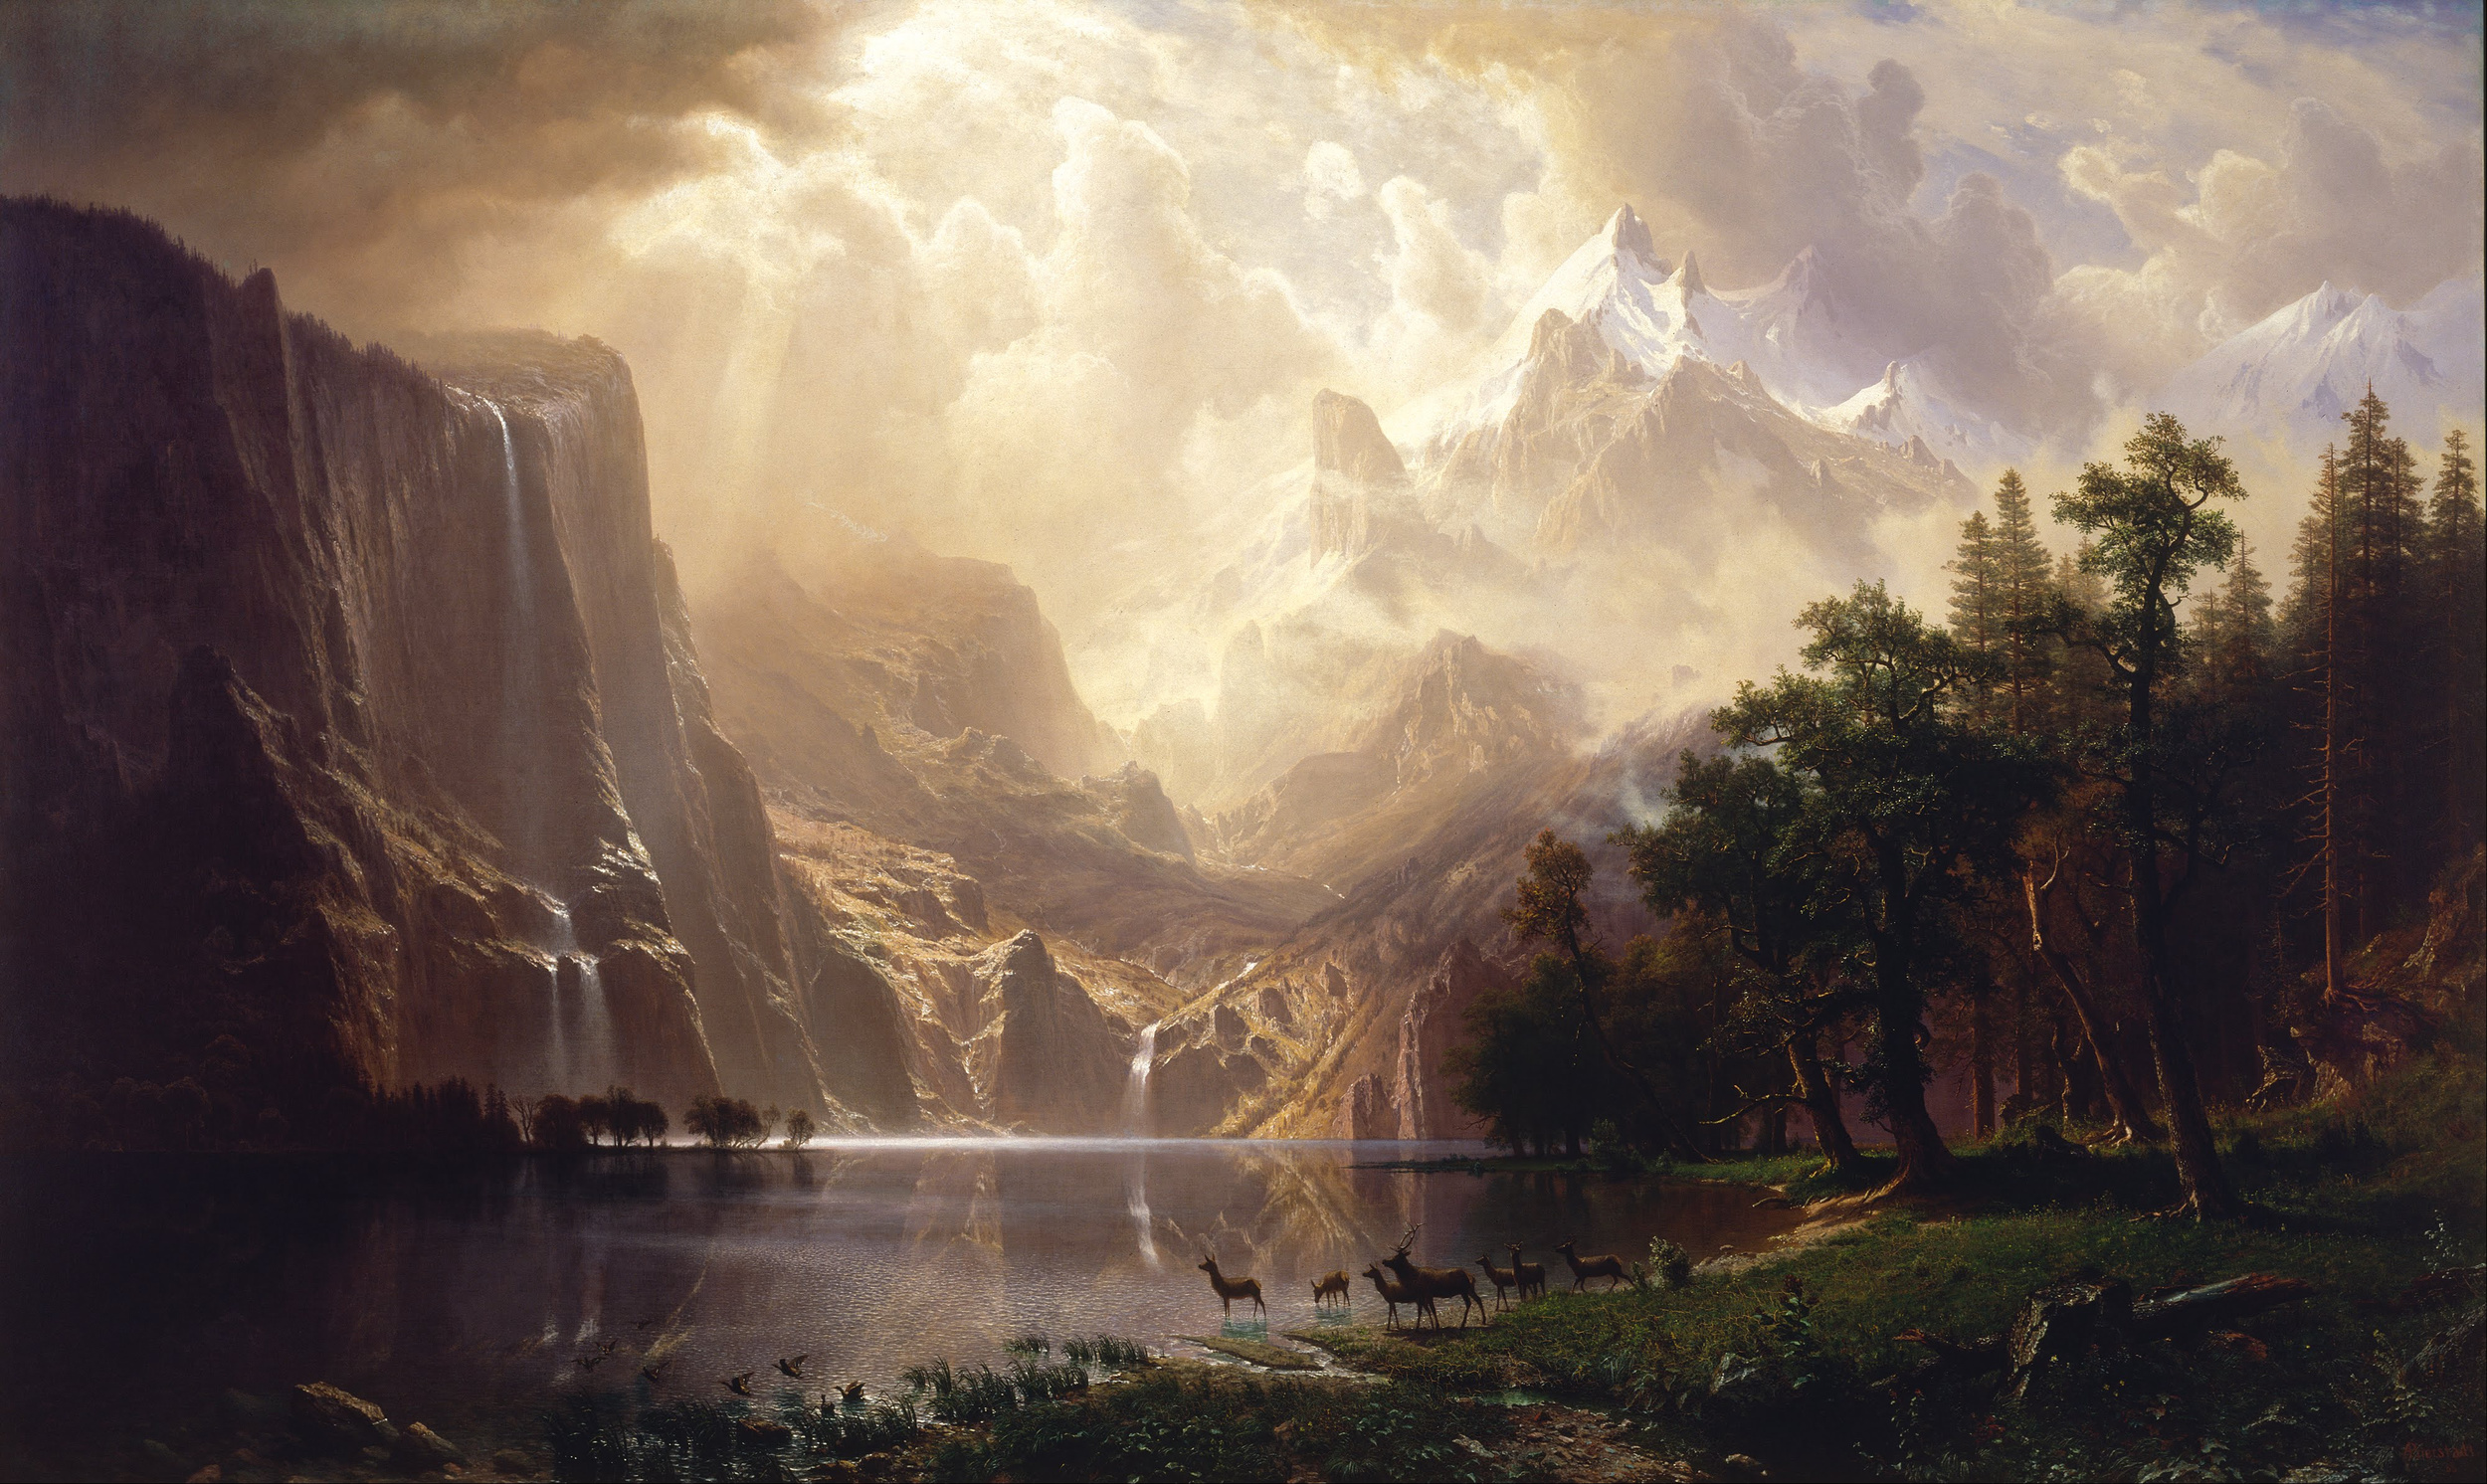 Albert Bierstadt, Among the Sierra Nevada Mountains, California (1868), Smithsonian American Art Museum, Washington, DC.